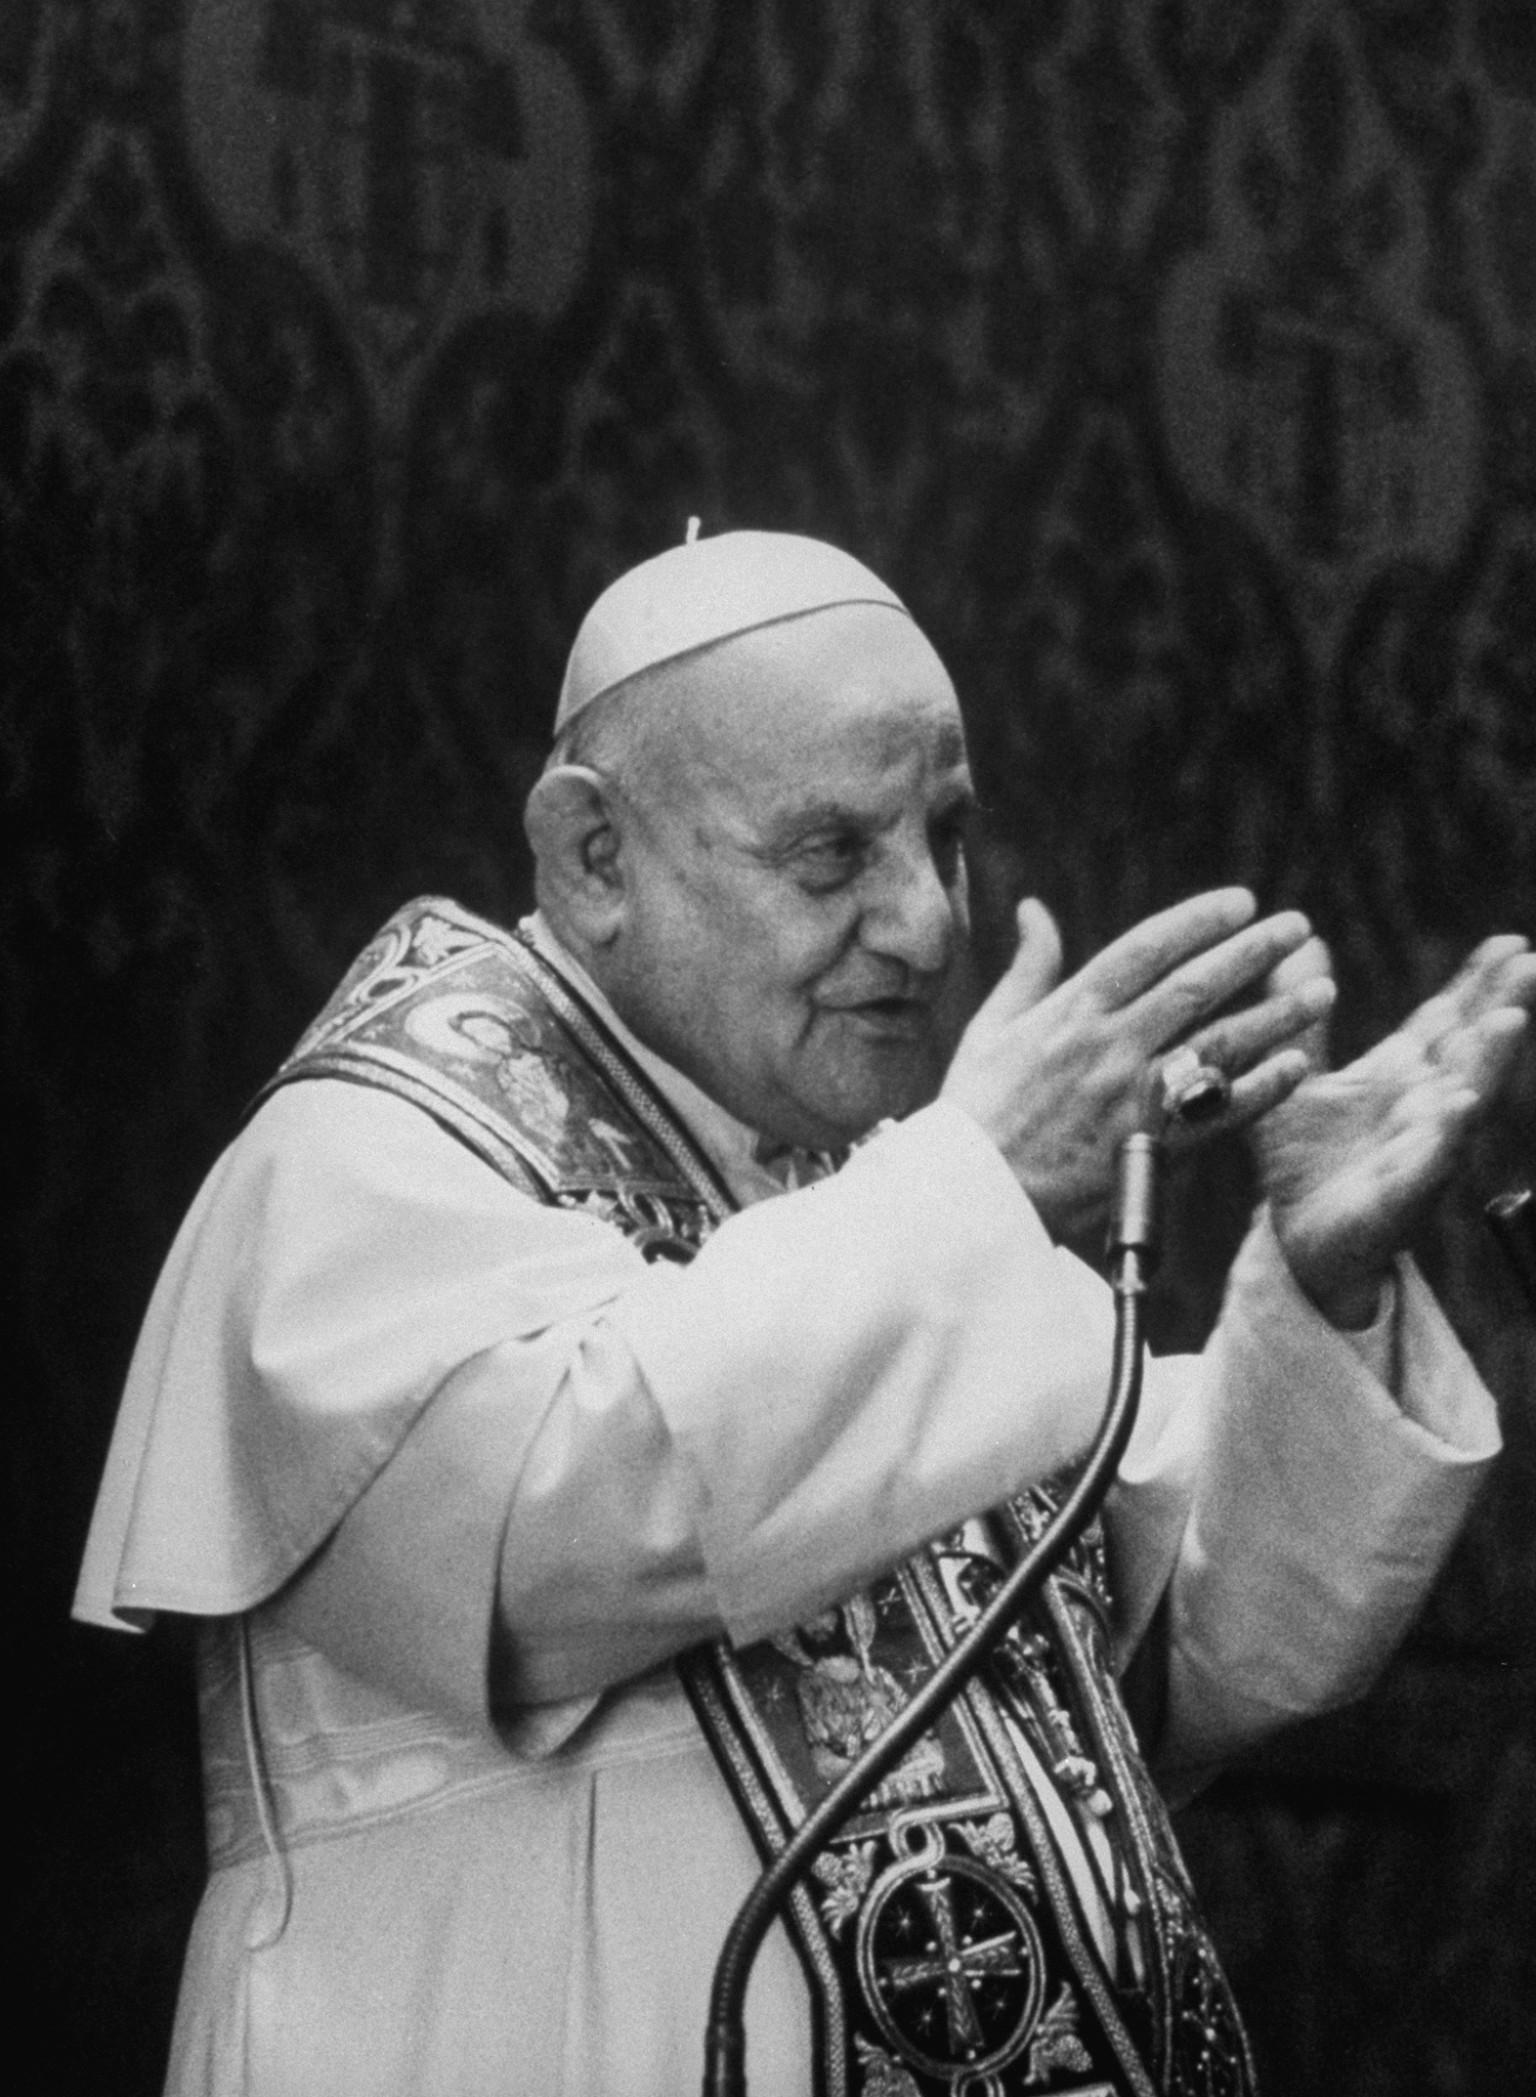 pope john xx111 On the occasion of pope john xxiii's canonization, lifecom recalls the landmark vatican ii council that heralded a new era in the church.